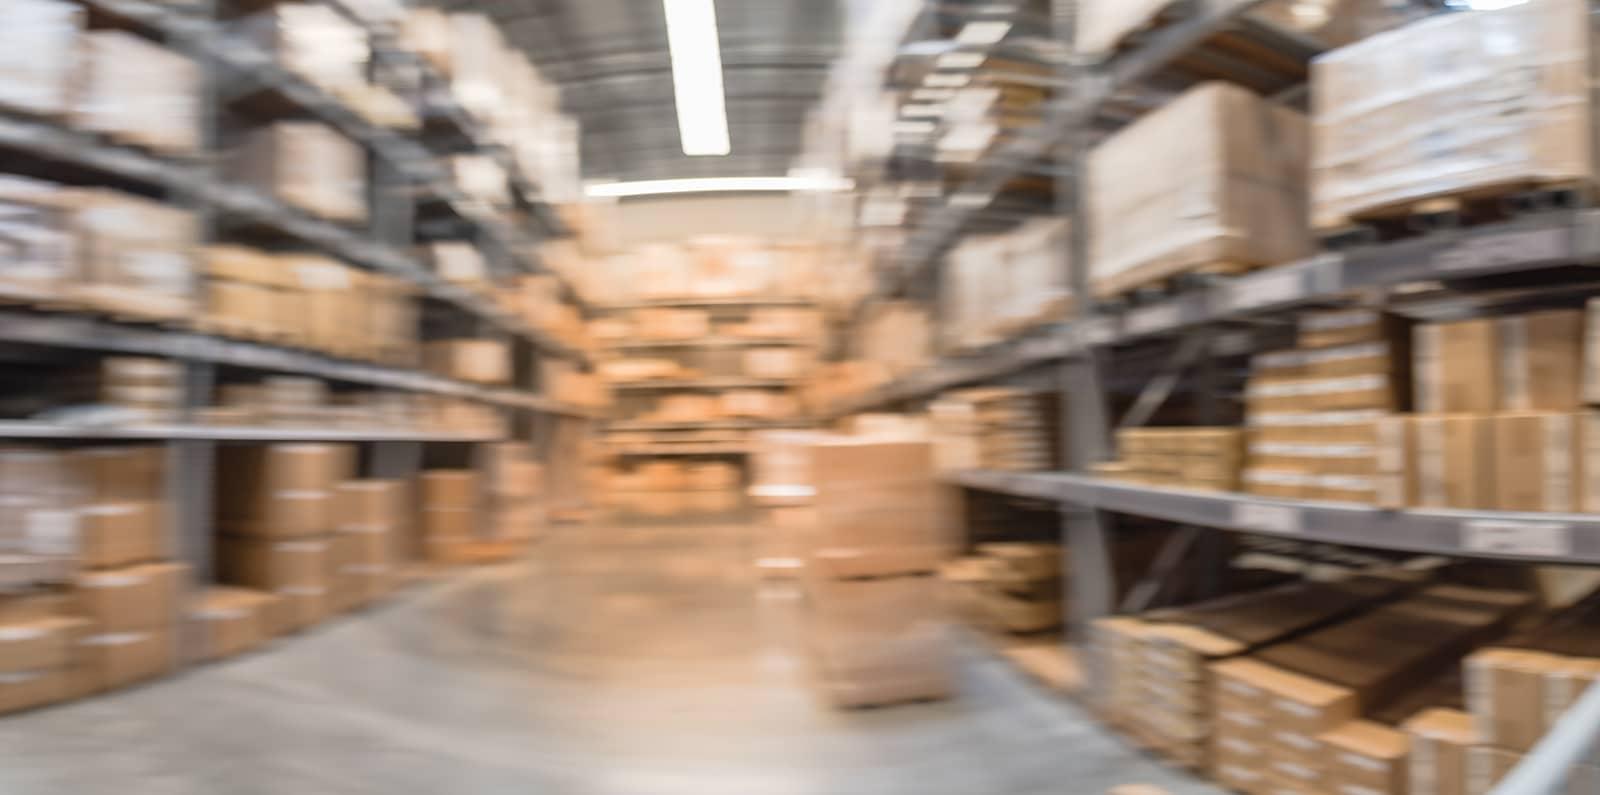 Cantilevered Storage Rack Safety